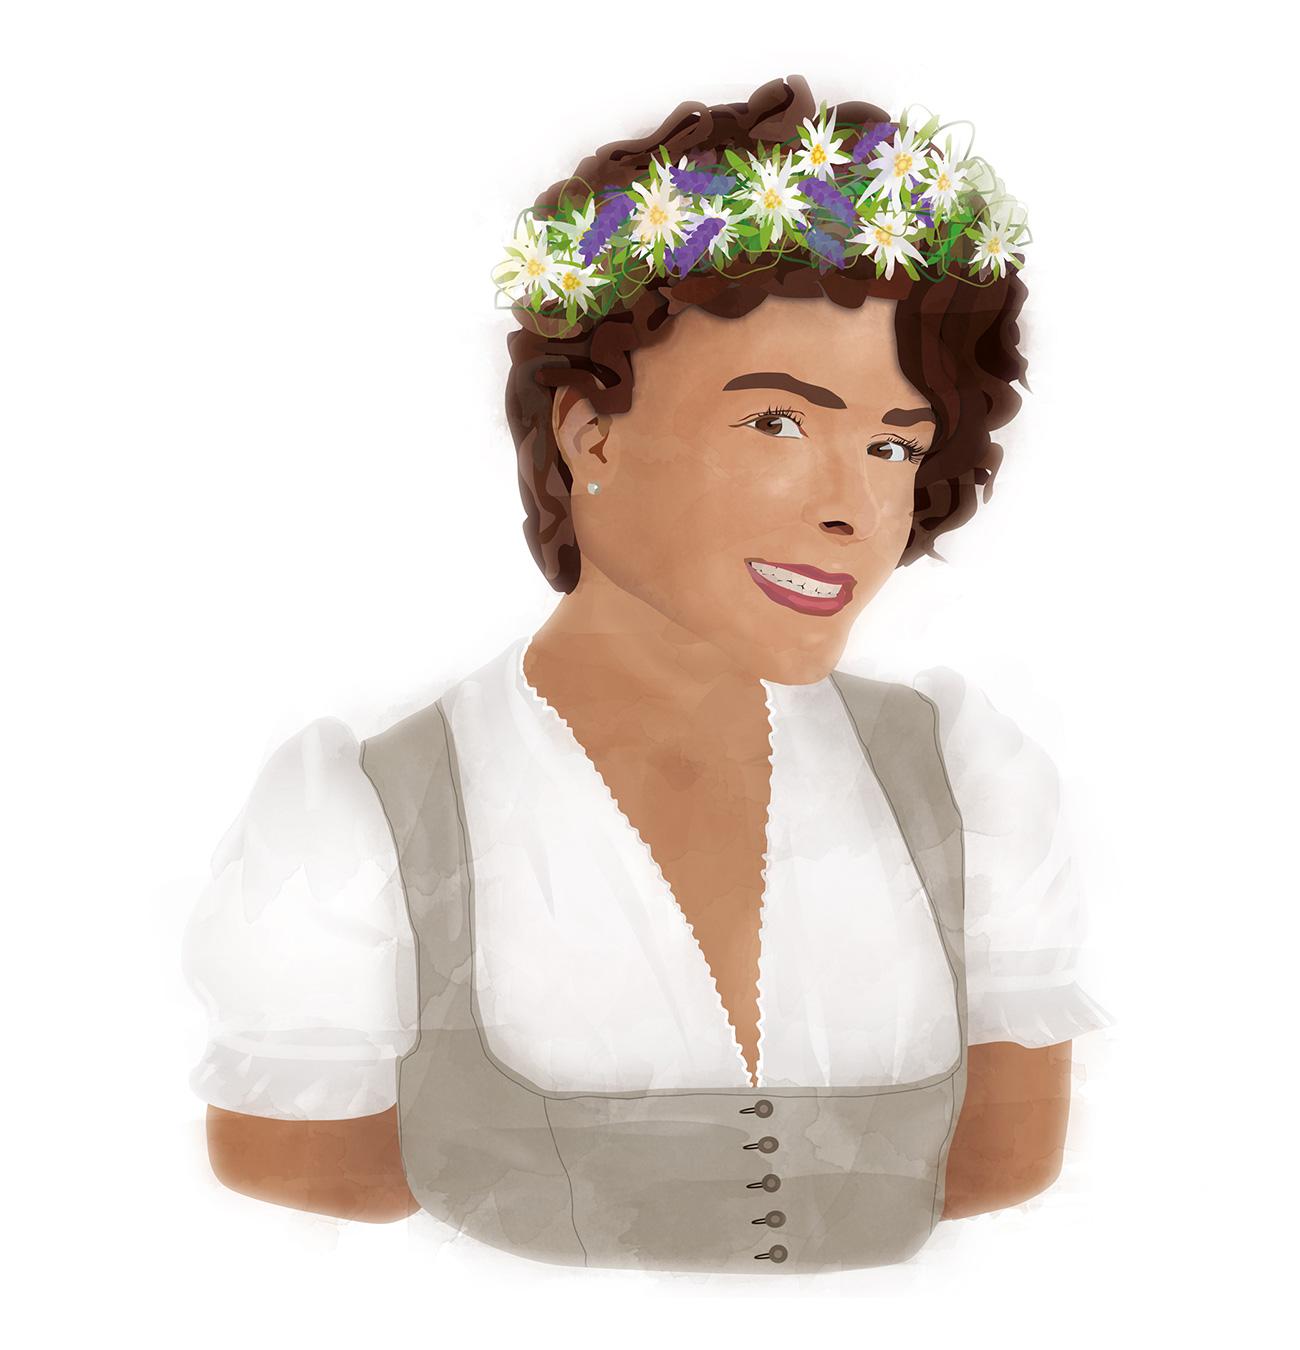 almerin-blog-tanja-maria-alm-hinterthal